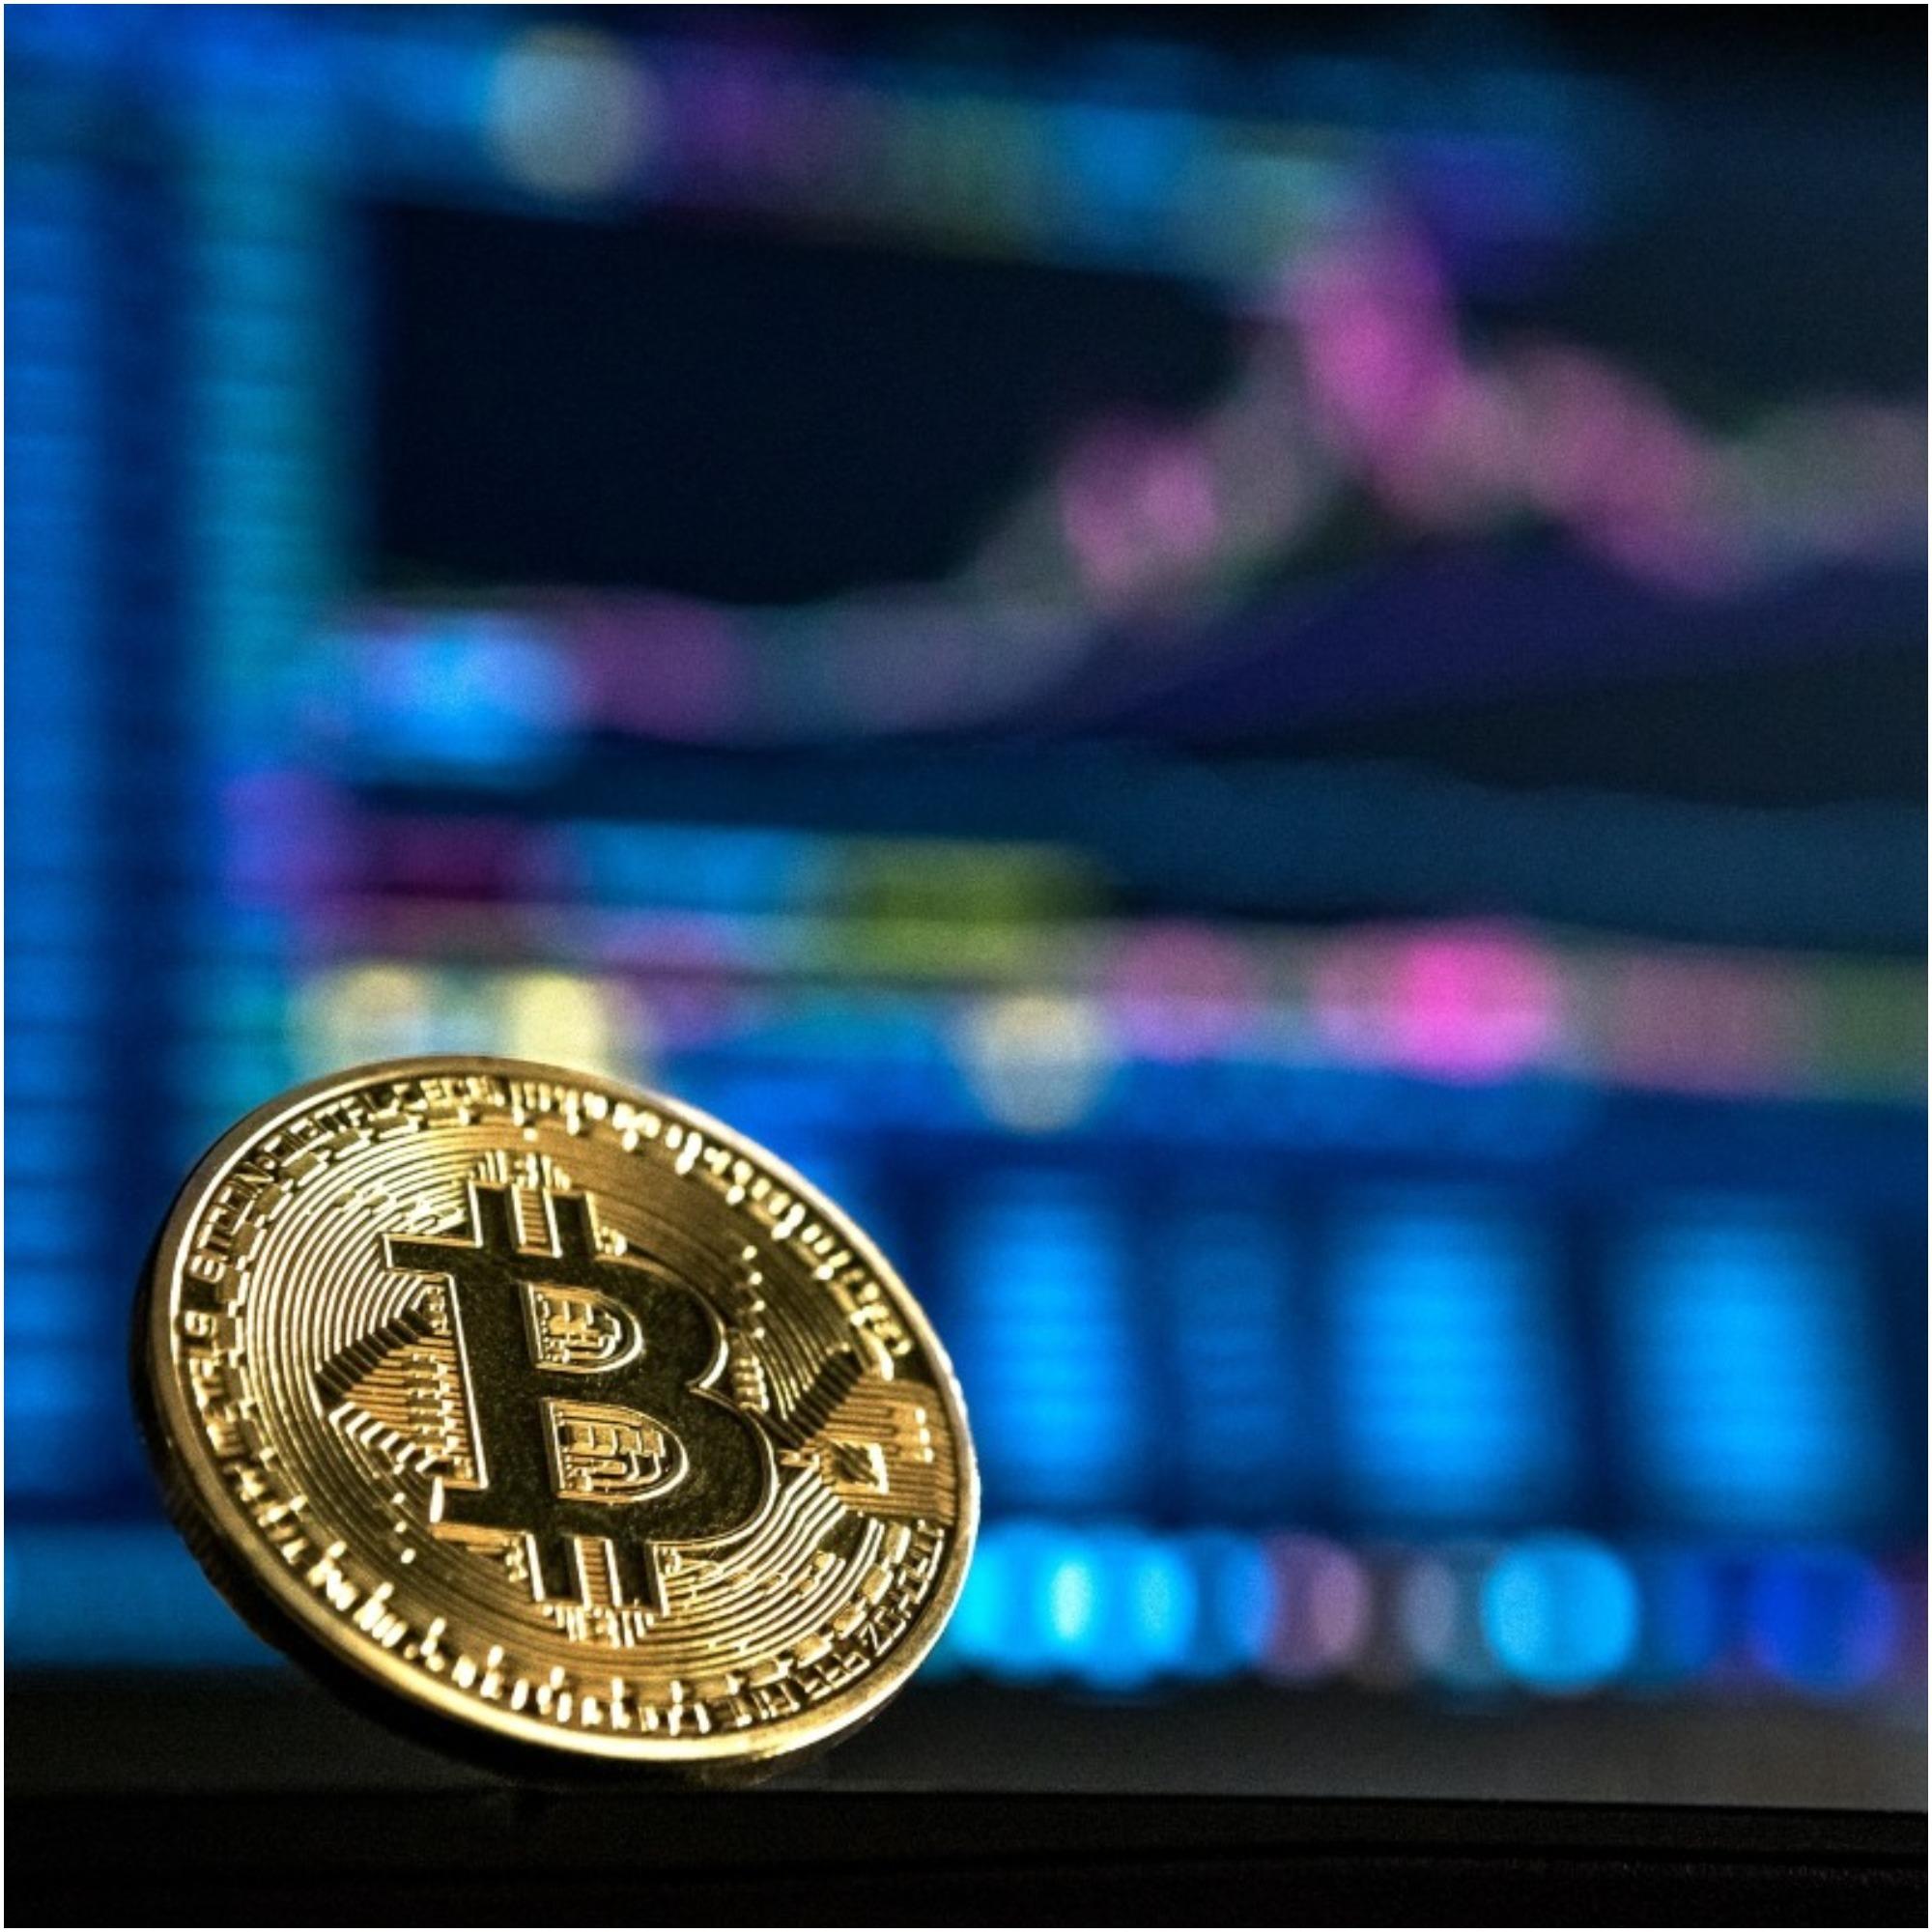 Meiilleur-Site pour investir crypto monnaie